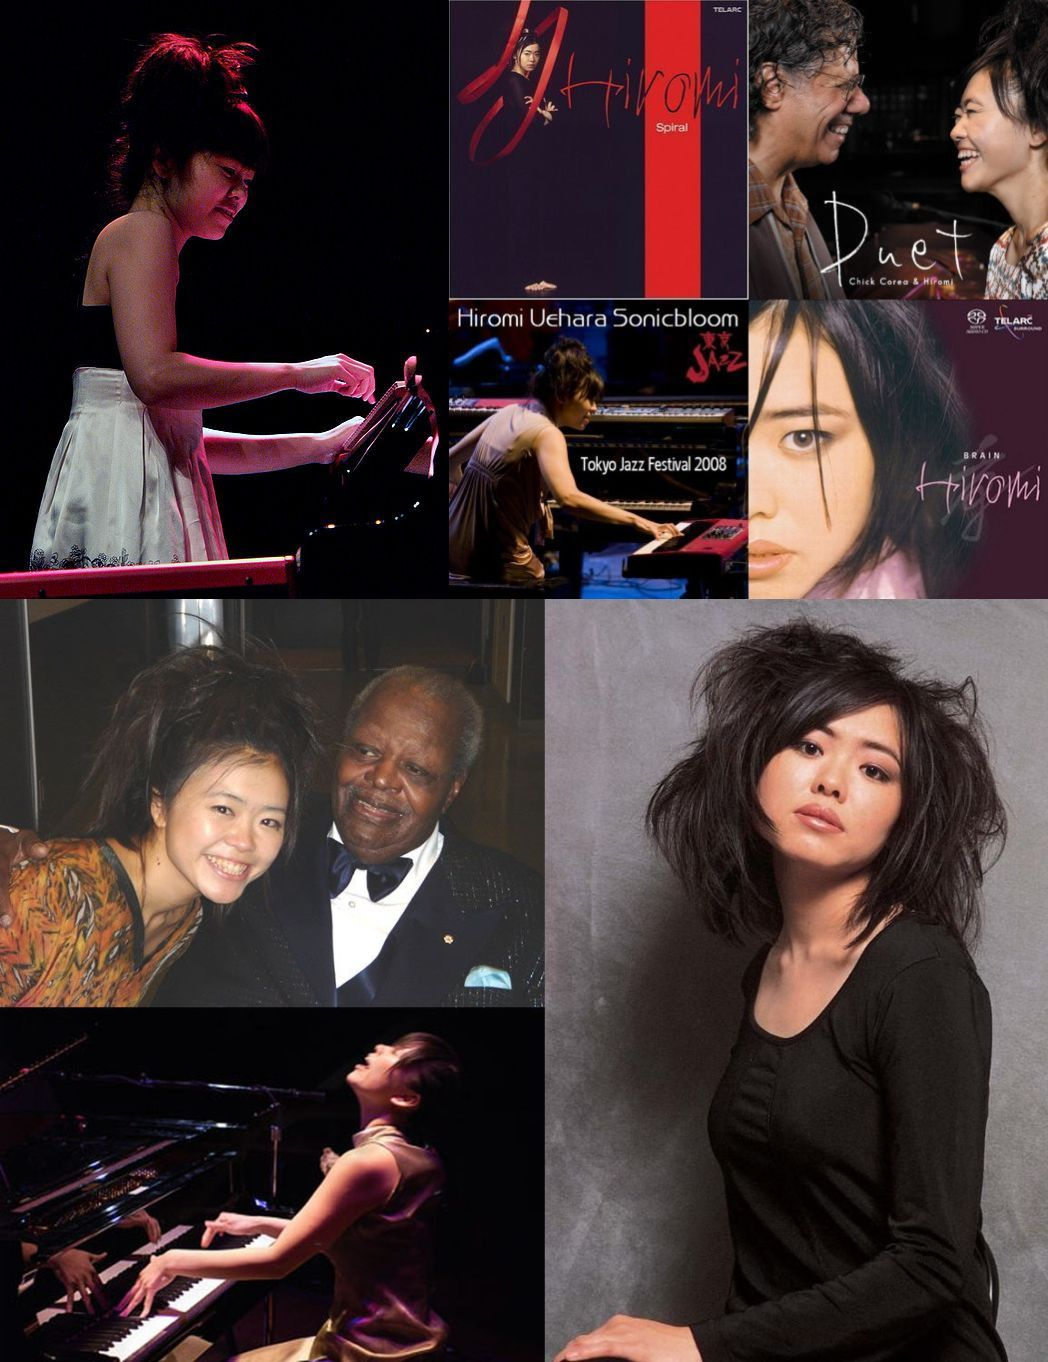 http://2.bp.blogspot.com/_Lmbijs2fZwI/S8Y8dDZxj6I/AAAAAAAAEqg/jw_YLQQNhaU/s1600/Hiromi_Uehara.jpg